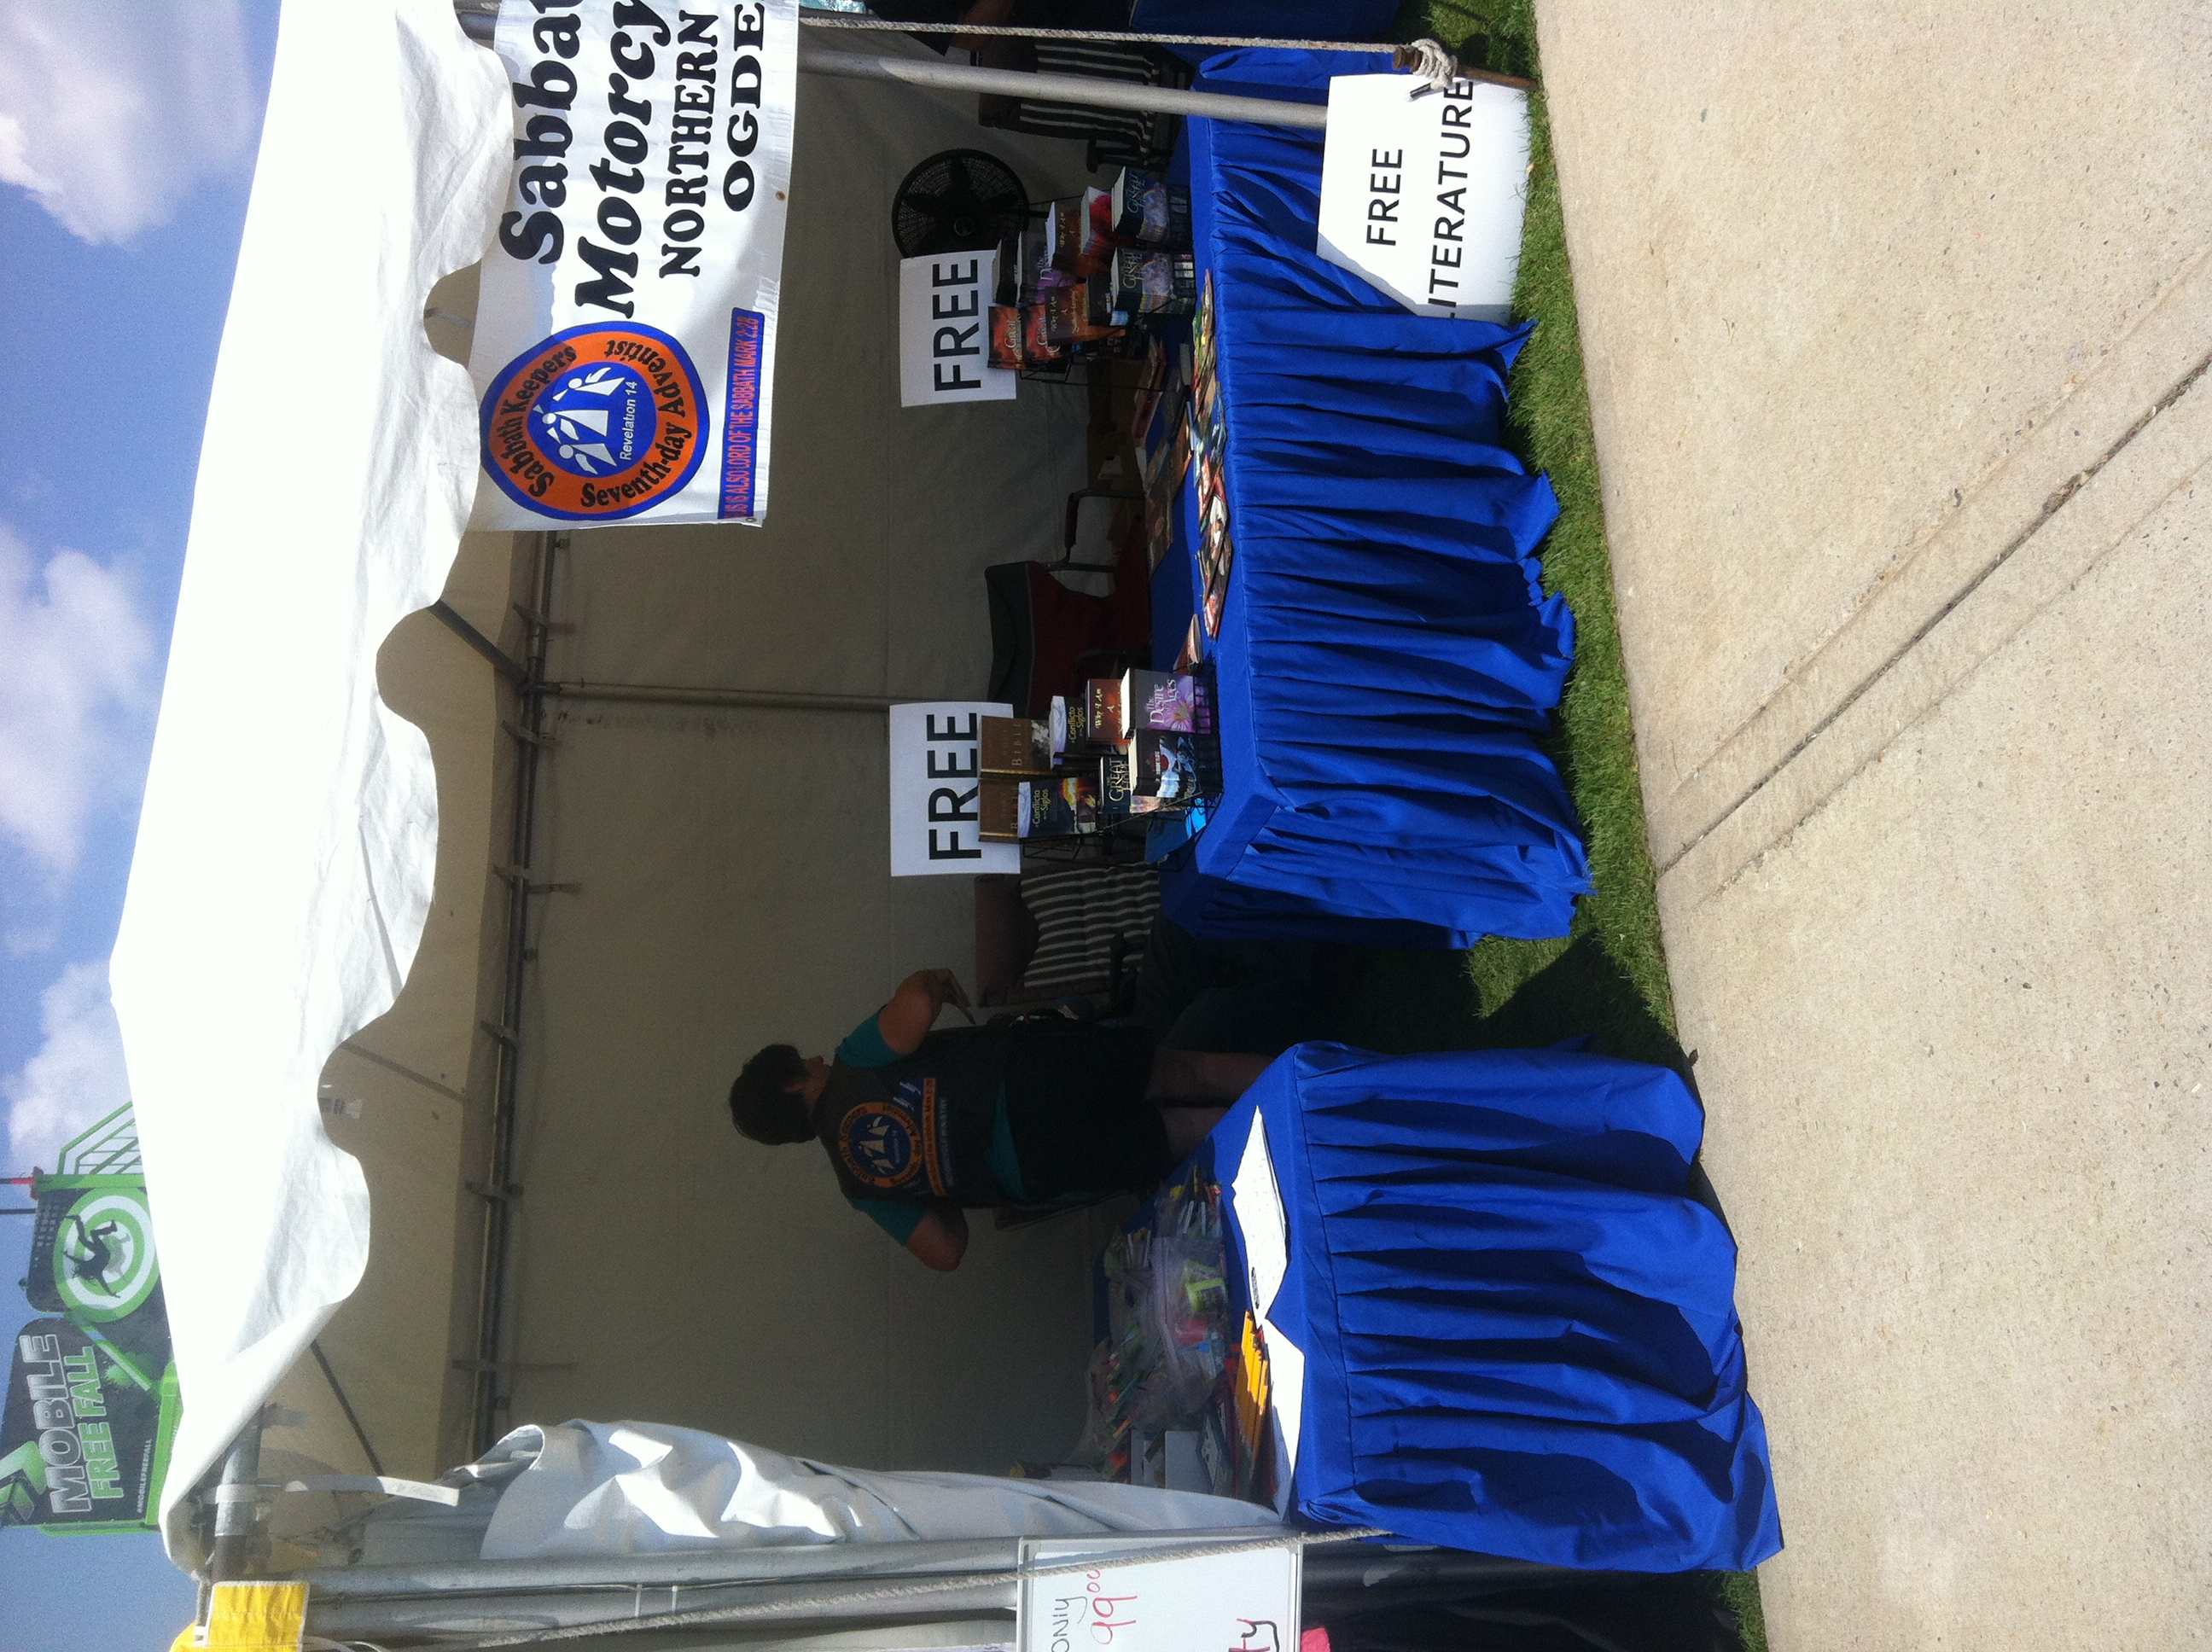 SKMM booth at the Weber County Fair in Ogden, Utah.